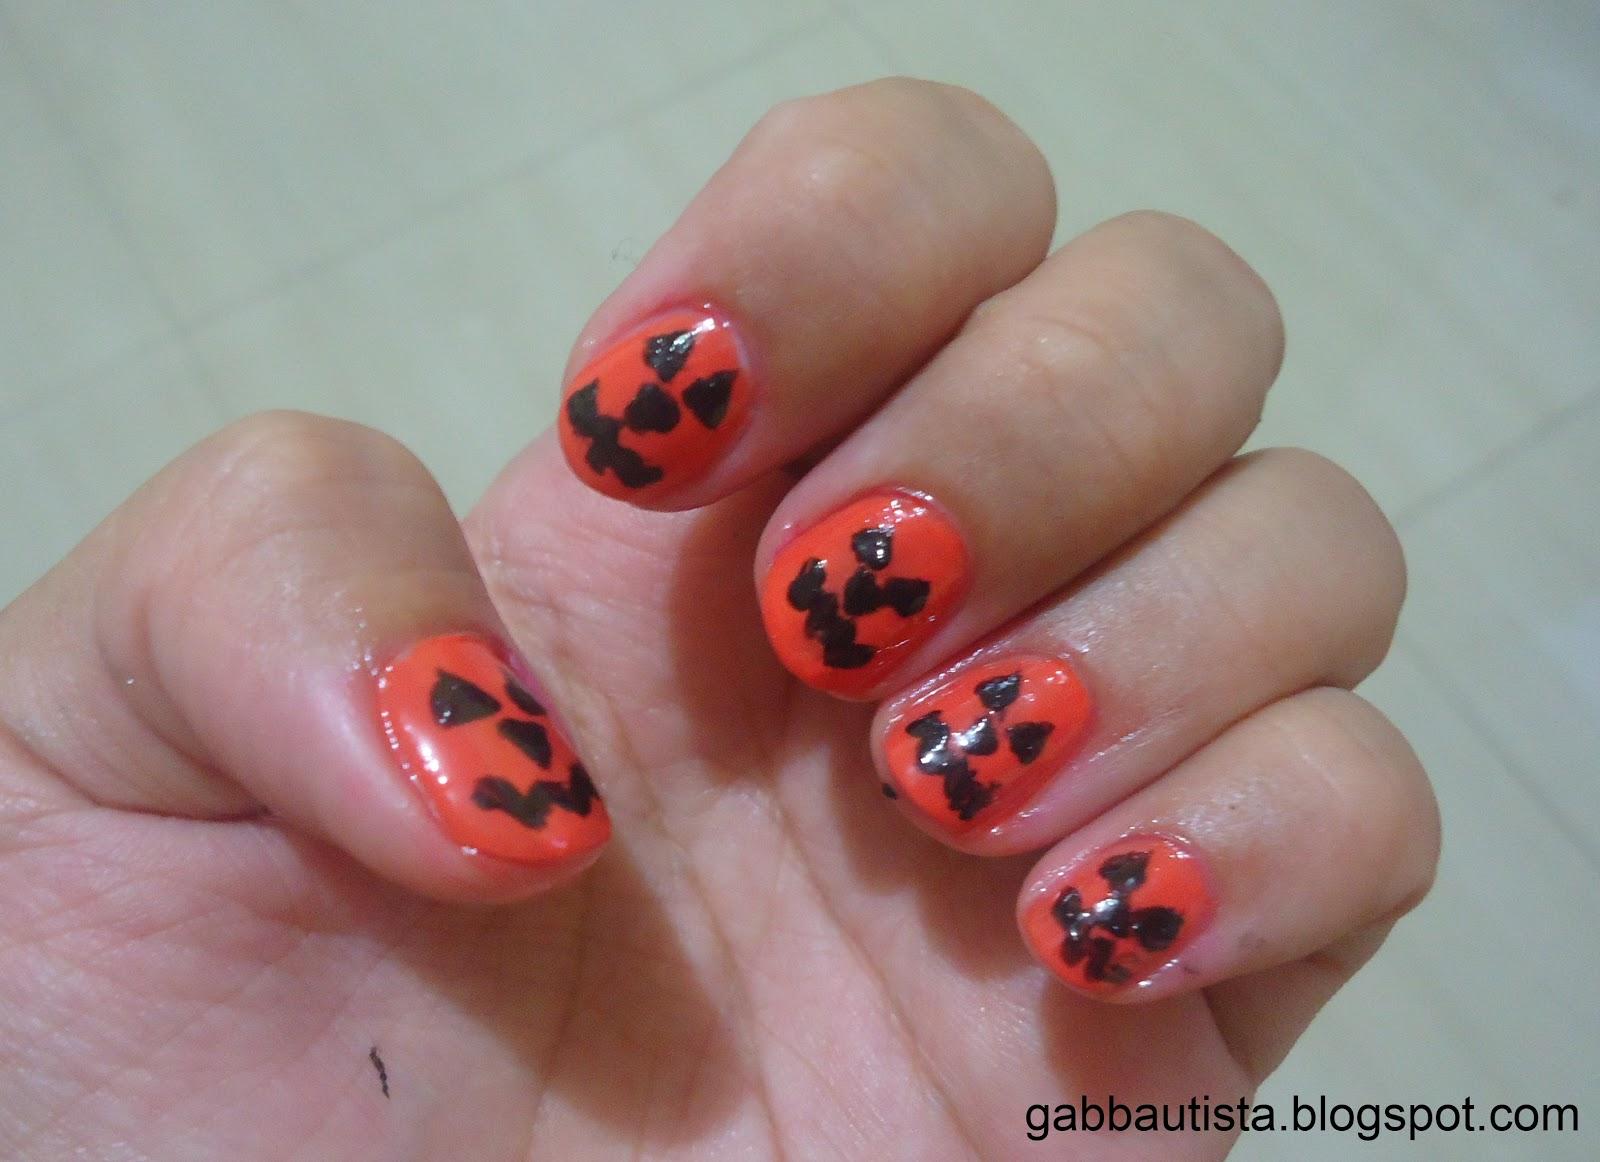 confessions of gab bautista: halloween nail art design 1: pumpkin